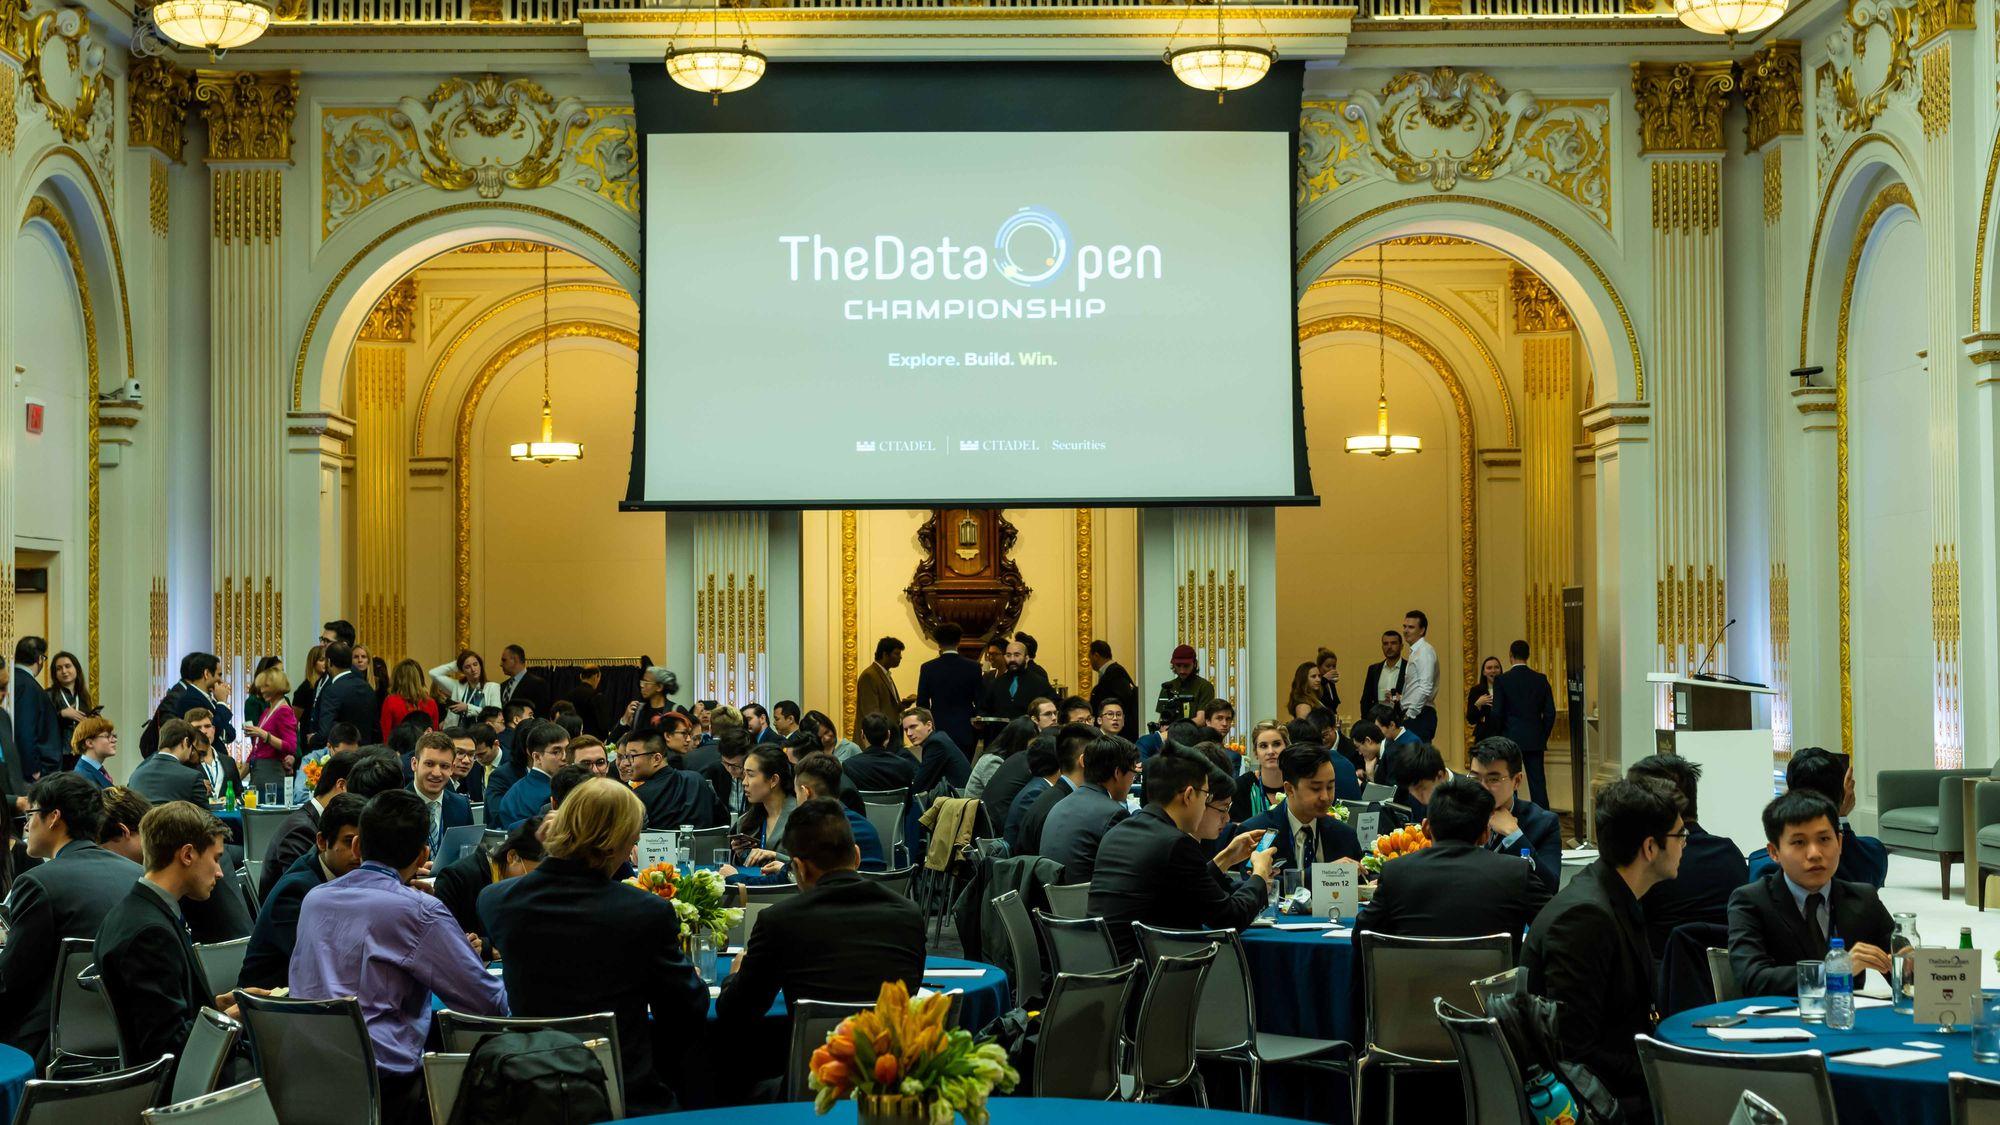 citadel datathon. citadel data open. The data open championship. caltech data science